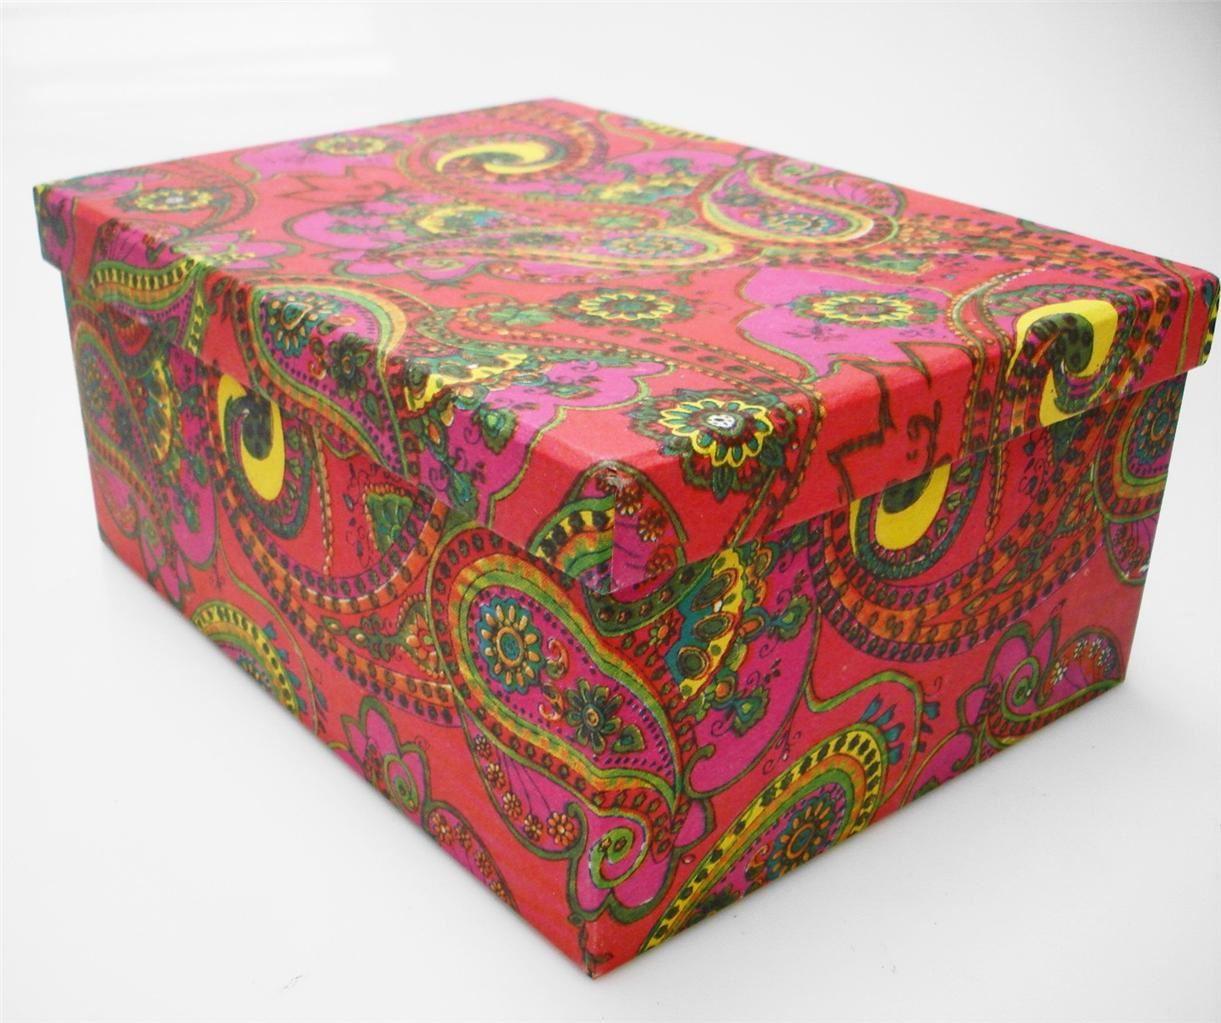 recycled colourful flower cardboard crafts storage box. Black Bedroom Furniture Sets. Home Design Ideas